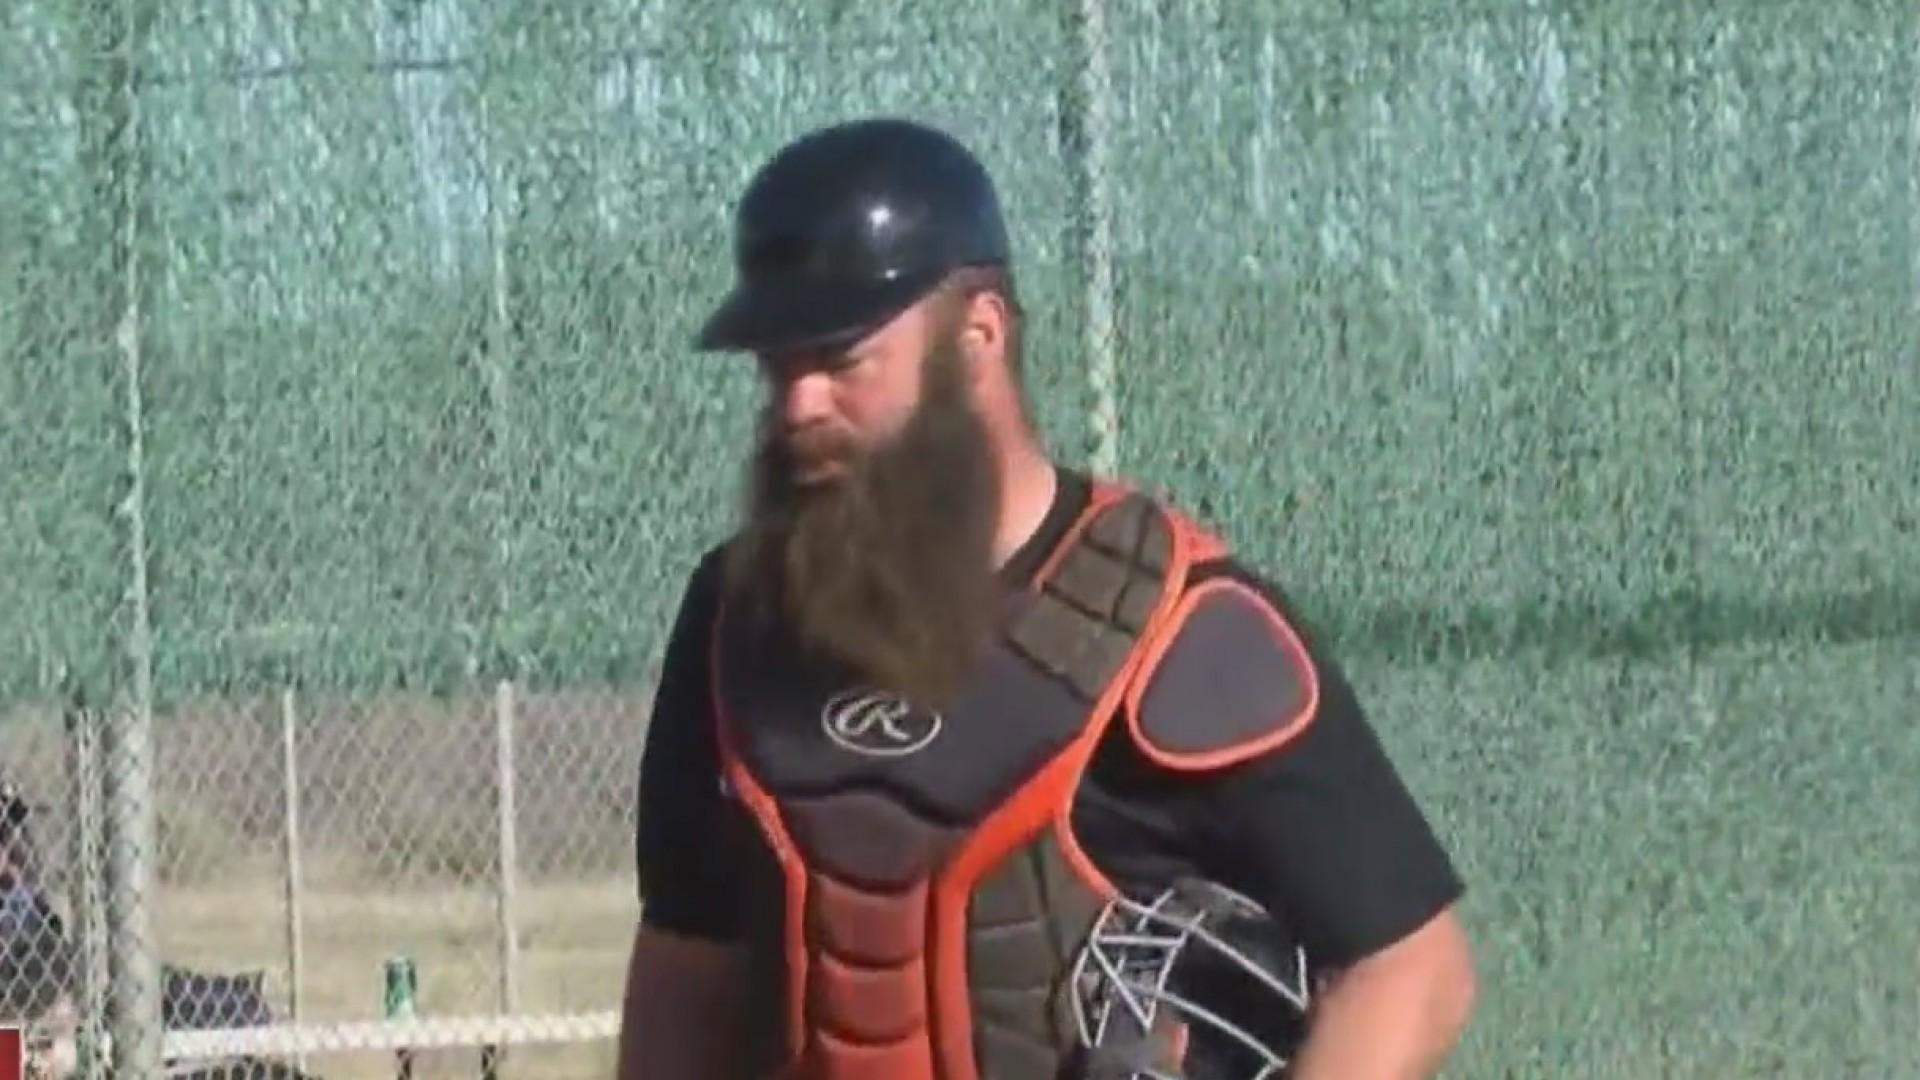 Houston_Astros__Evan_Gattis_Plays_In_UTP_1_20190120052337